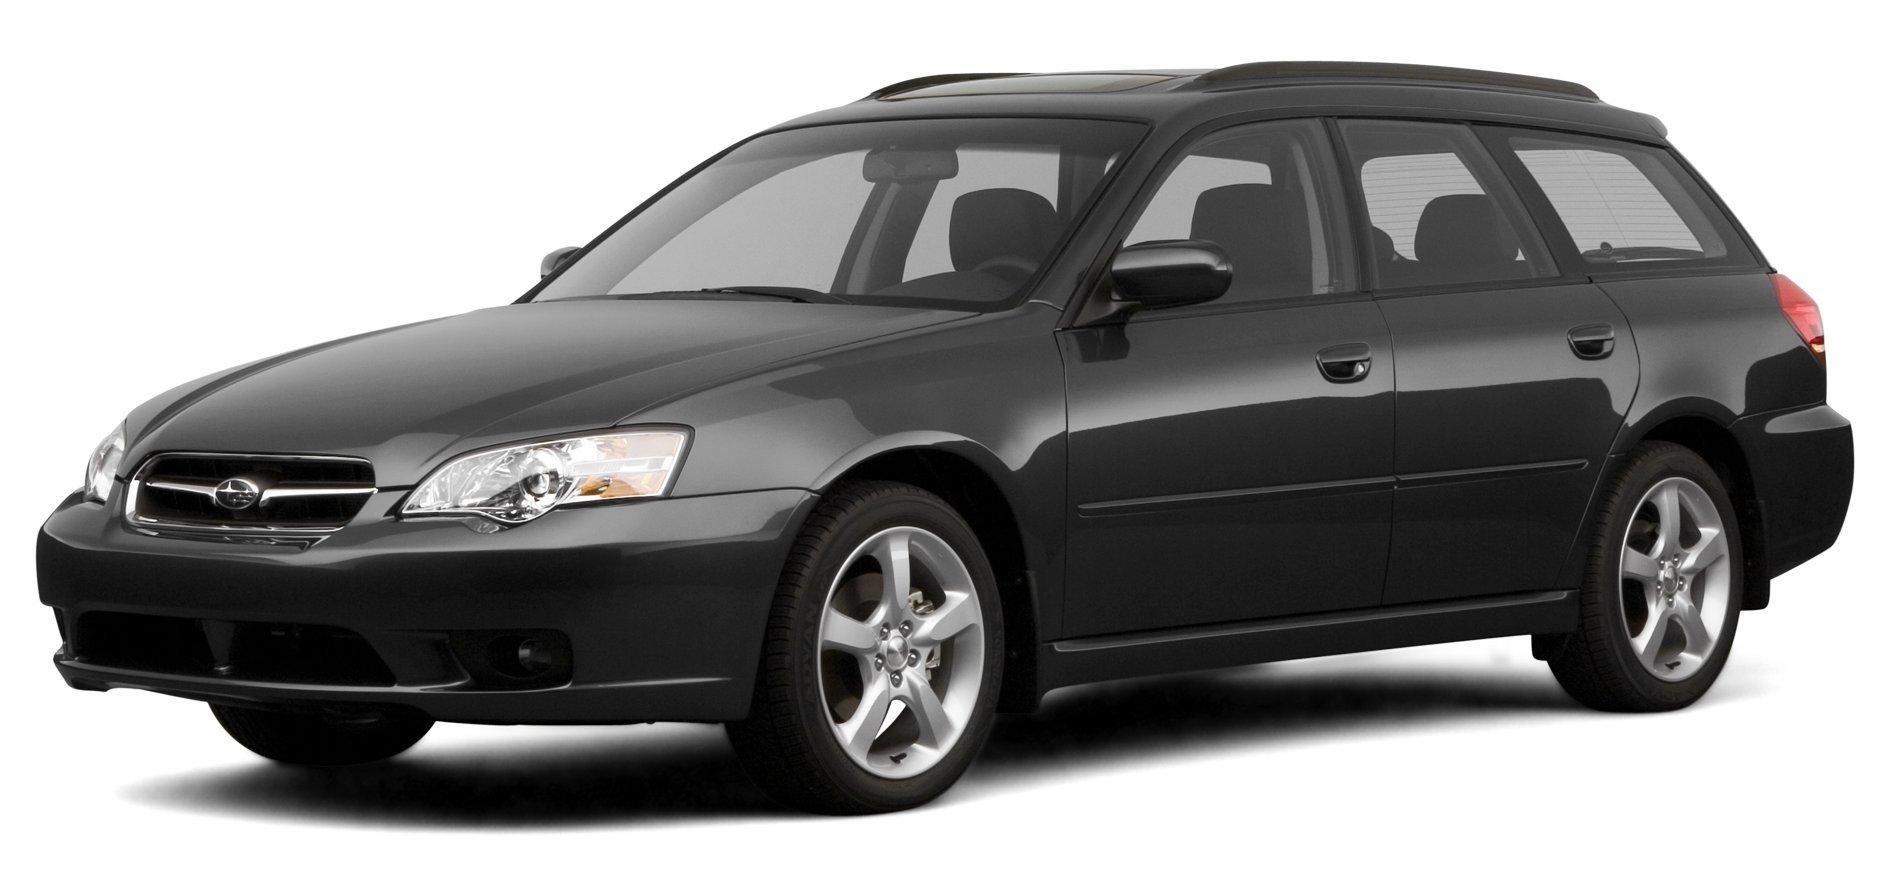 Subaru Legacy on 2007 subaru wrx sti, 2007 subaru forester, 2007 subaru baja turbo, 2007 subaru impreza, 18x8.75 on 06 legacy, 2007 subaru xt, 2007 subaru liberty, 2007 subaru wrx sedan, 2007 subaru crosstrek, 2007 subaru hatchback, 2007 subaru brz, 2007 subaru svx, 2007 subaru wagon, 2007 subaru suvs models, 2007 subaru tribeca, 2007 subaru outback,